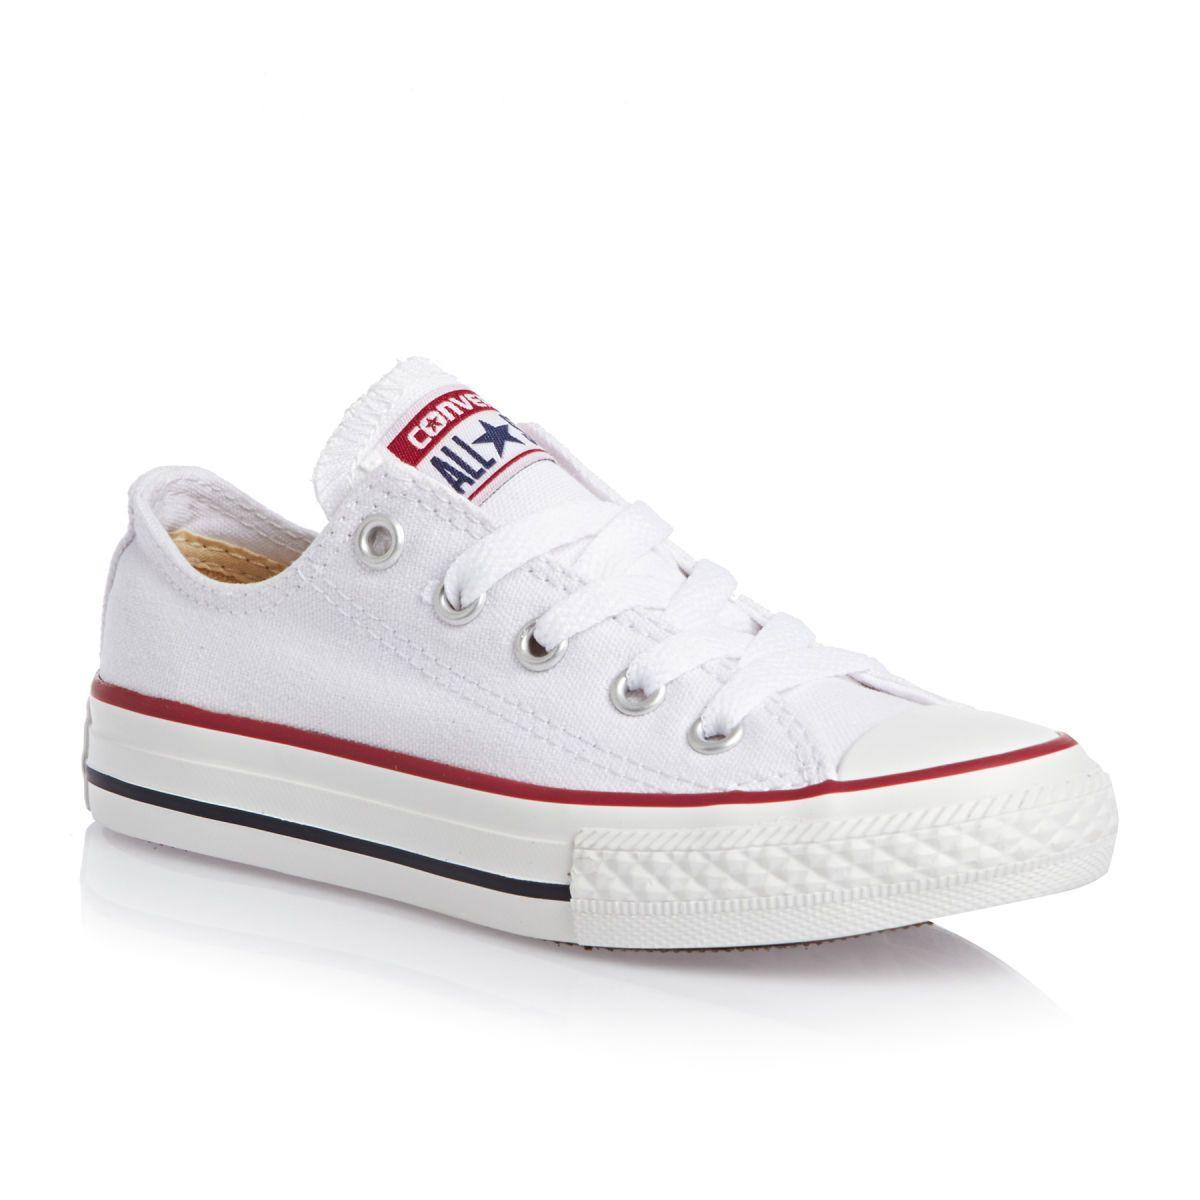 converse shoes ladies white